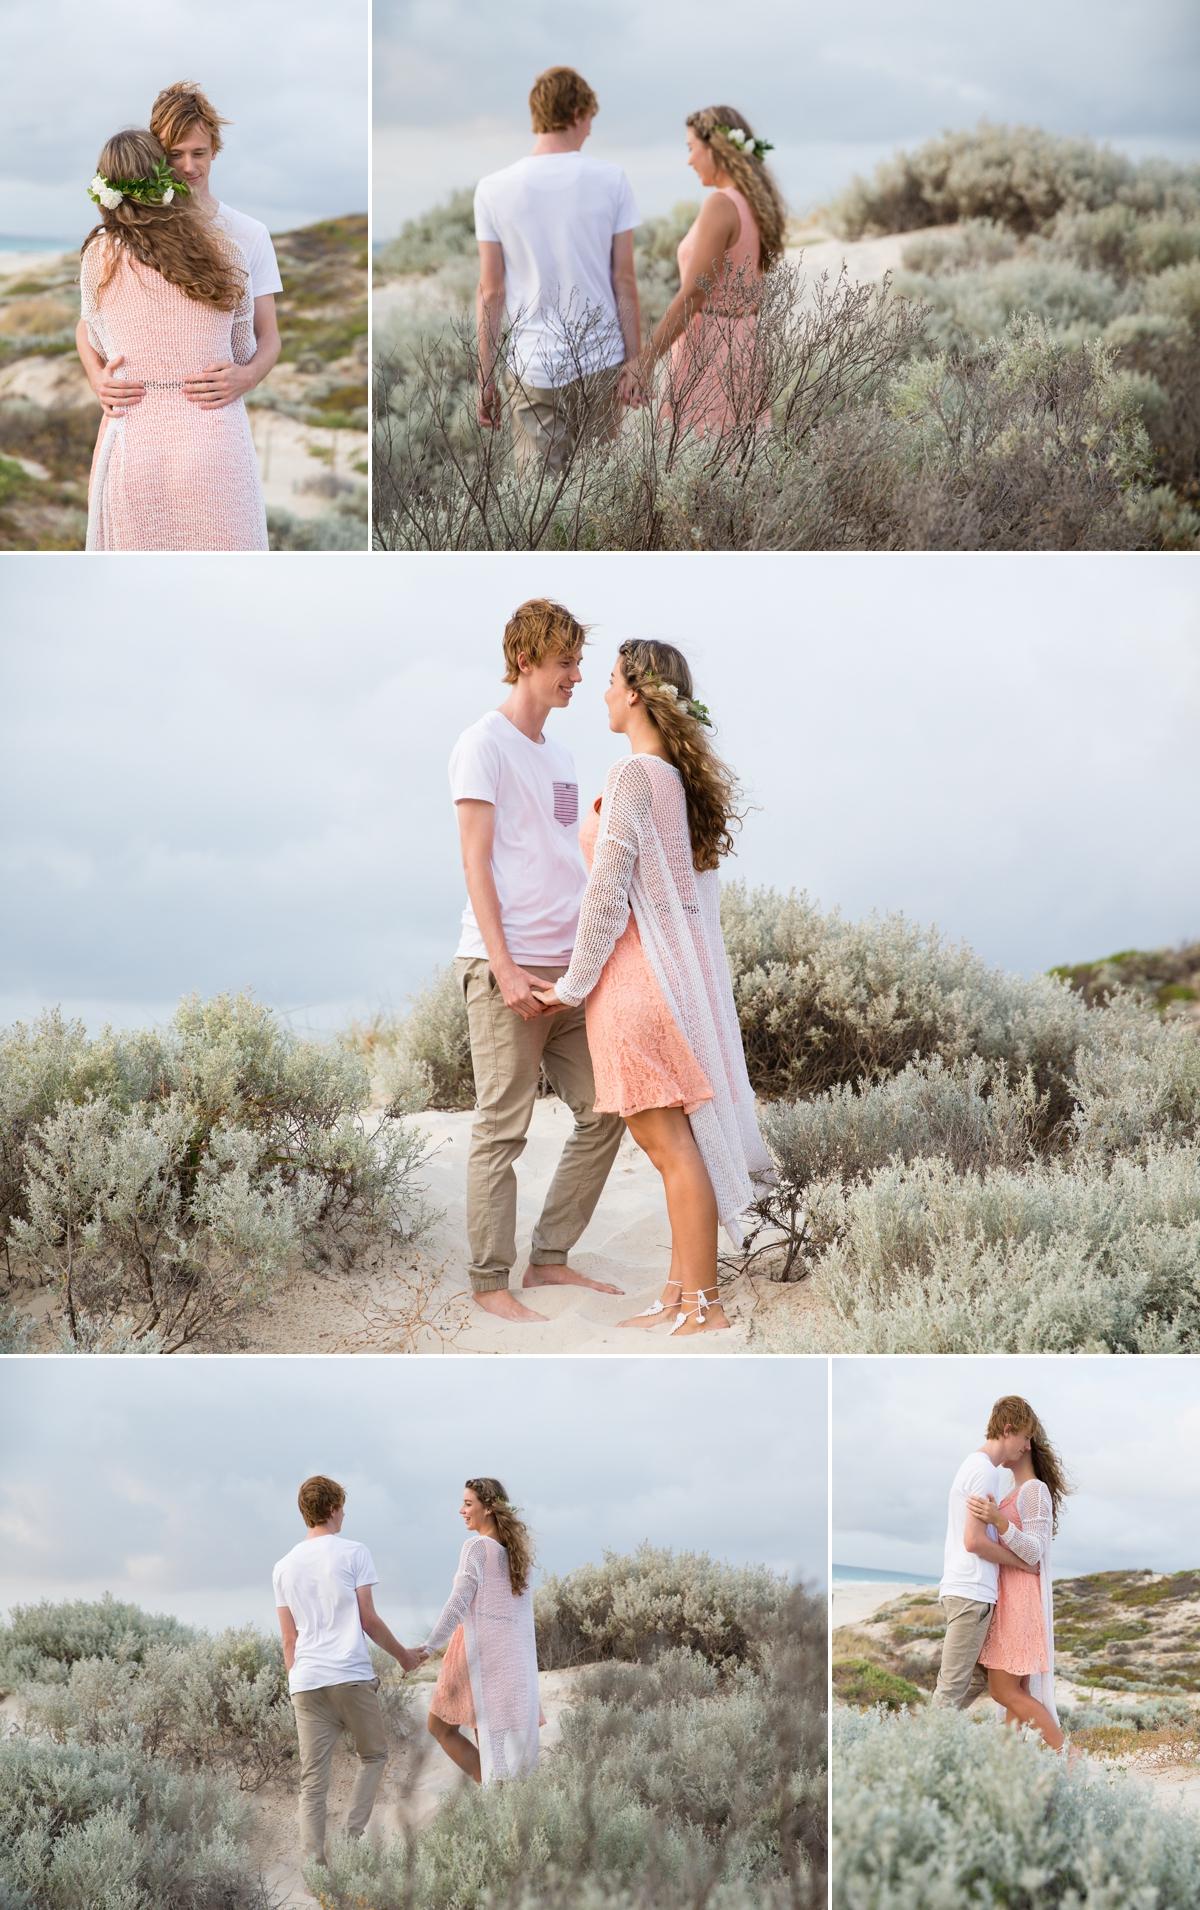 Luke and Sarah Engagement 3.jpg